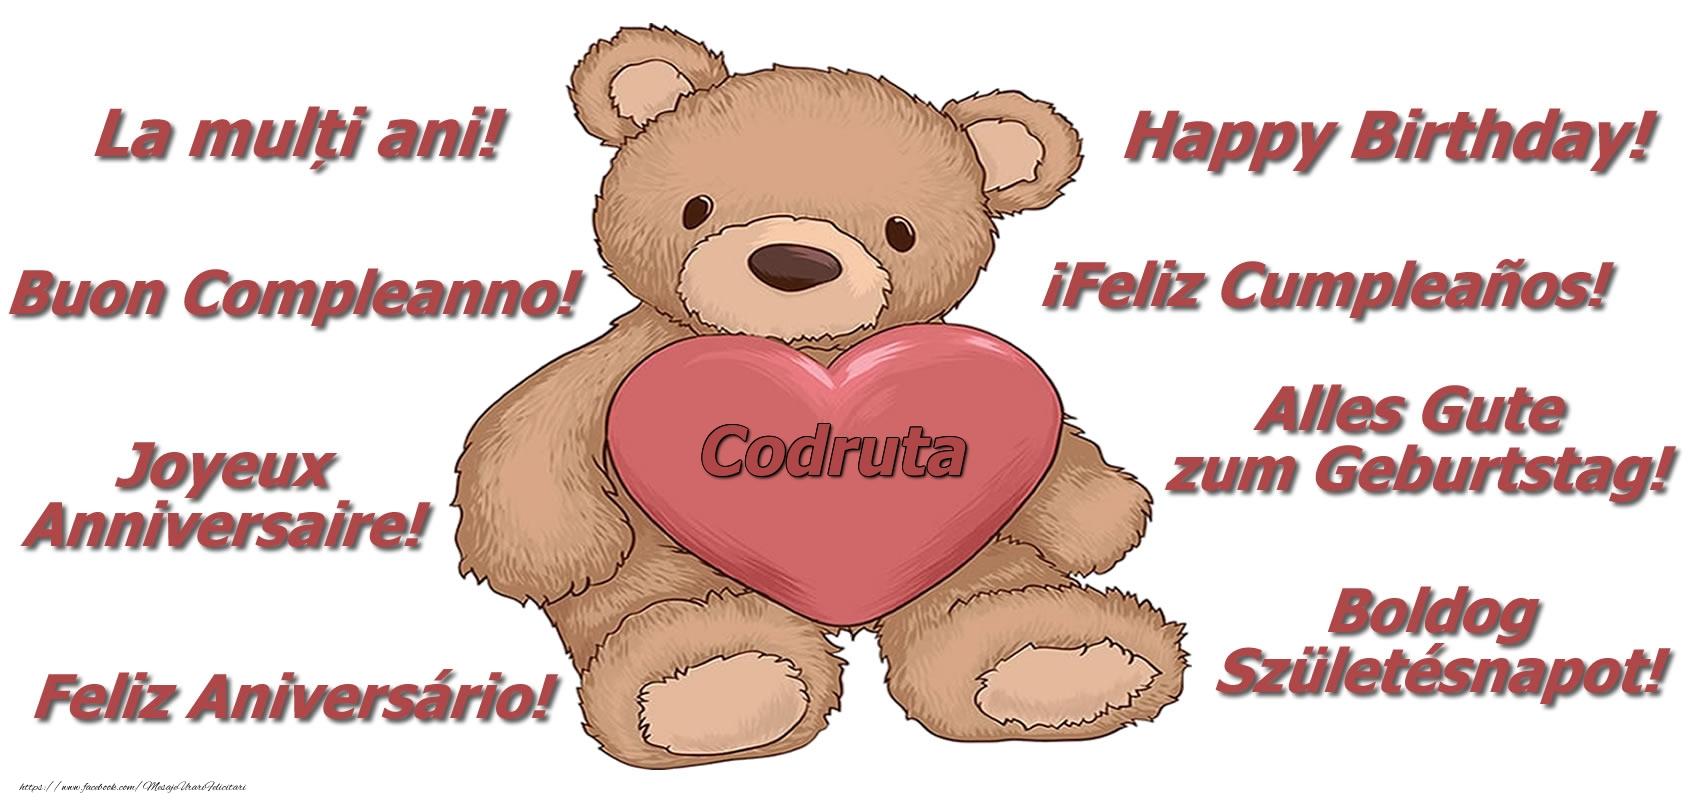 Felicitari de zi de nastere - La multi ani Codruta! - Ursulet